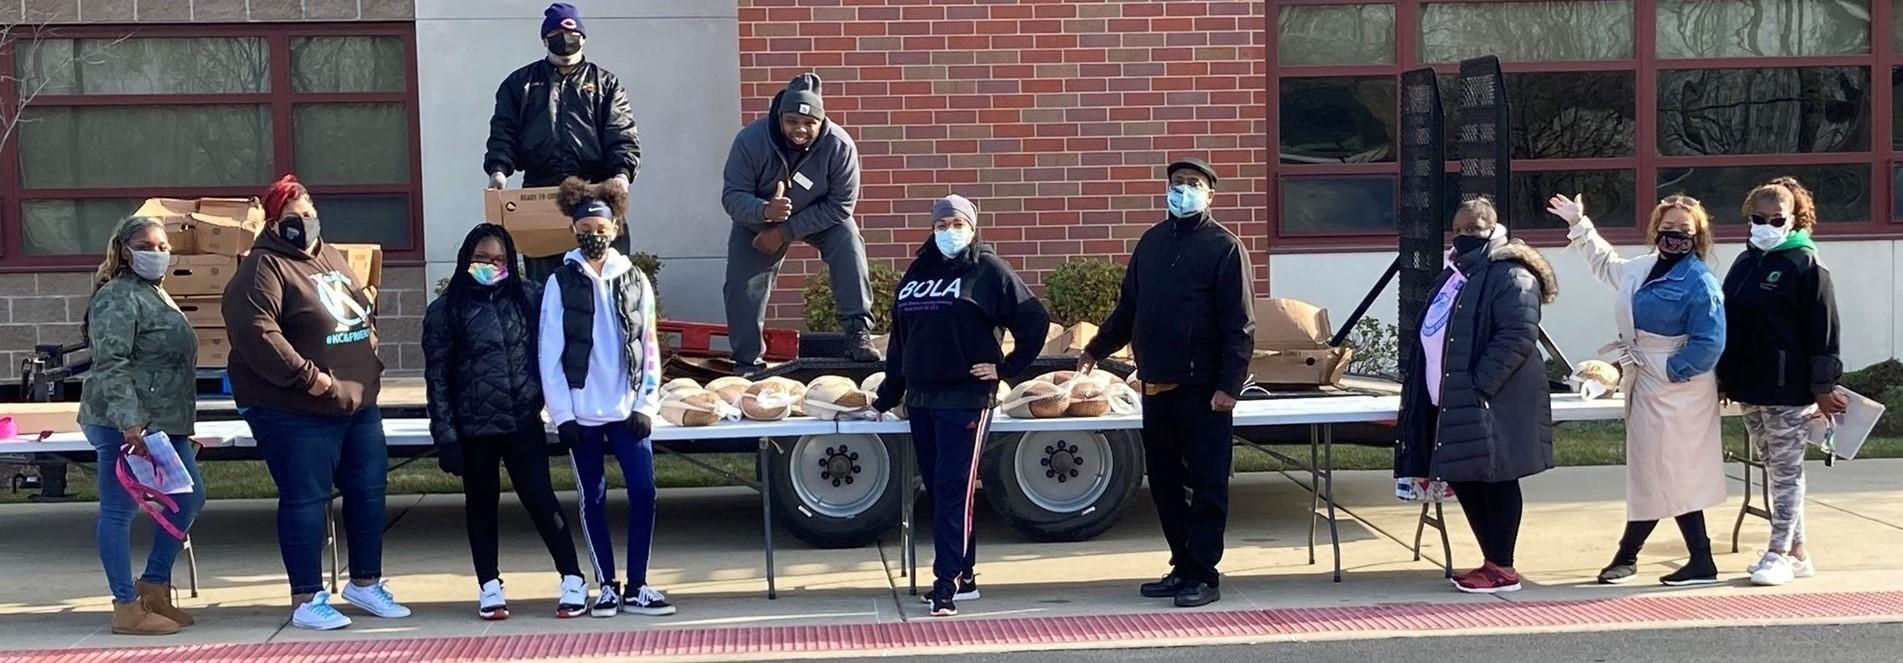 School Board President Dean Barnett, Superintendent Dr. Spells and staff serving the community with free turkeys.